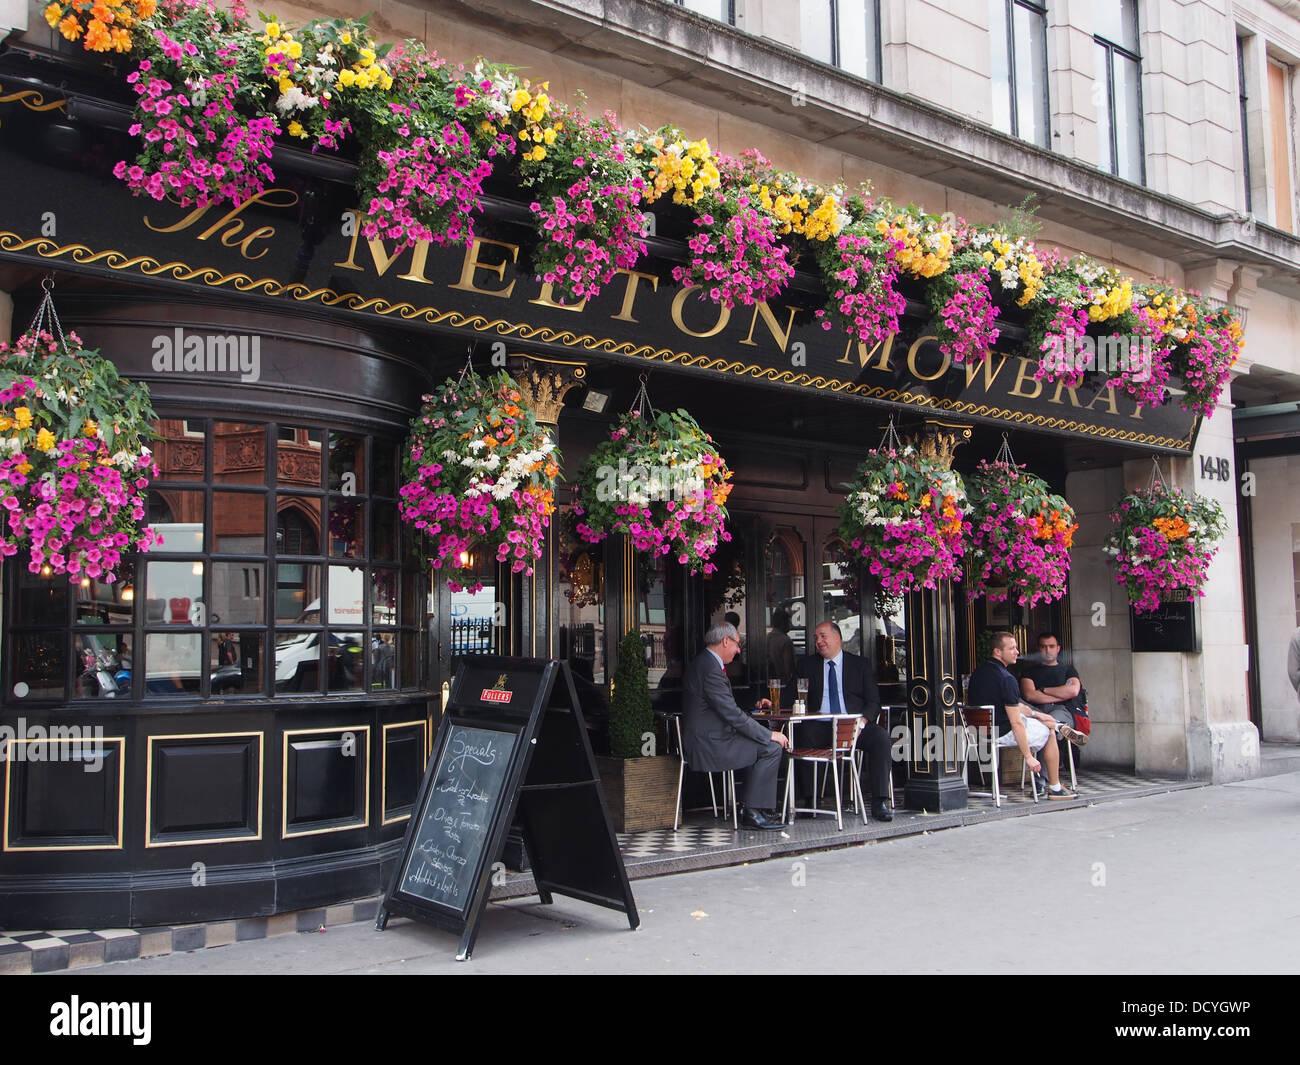 London upscale pub, customers seated outside - Stock Image